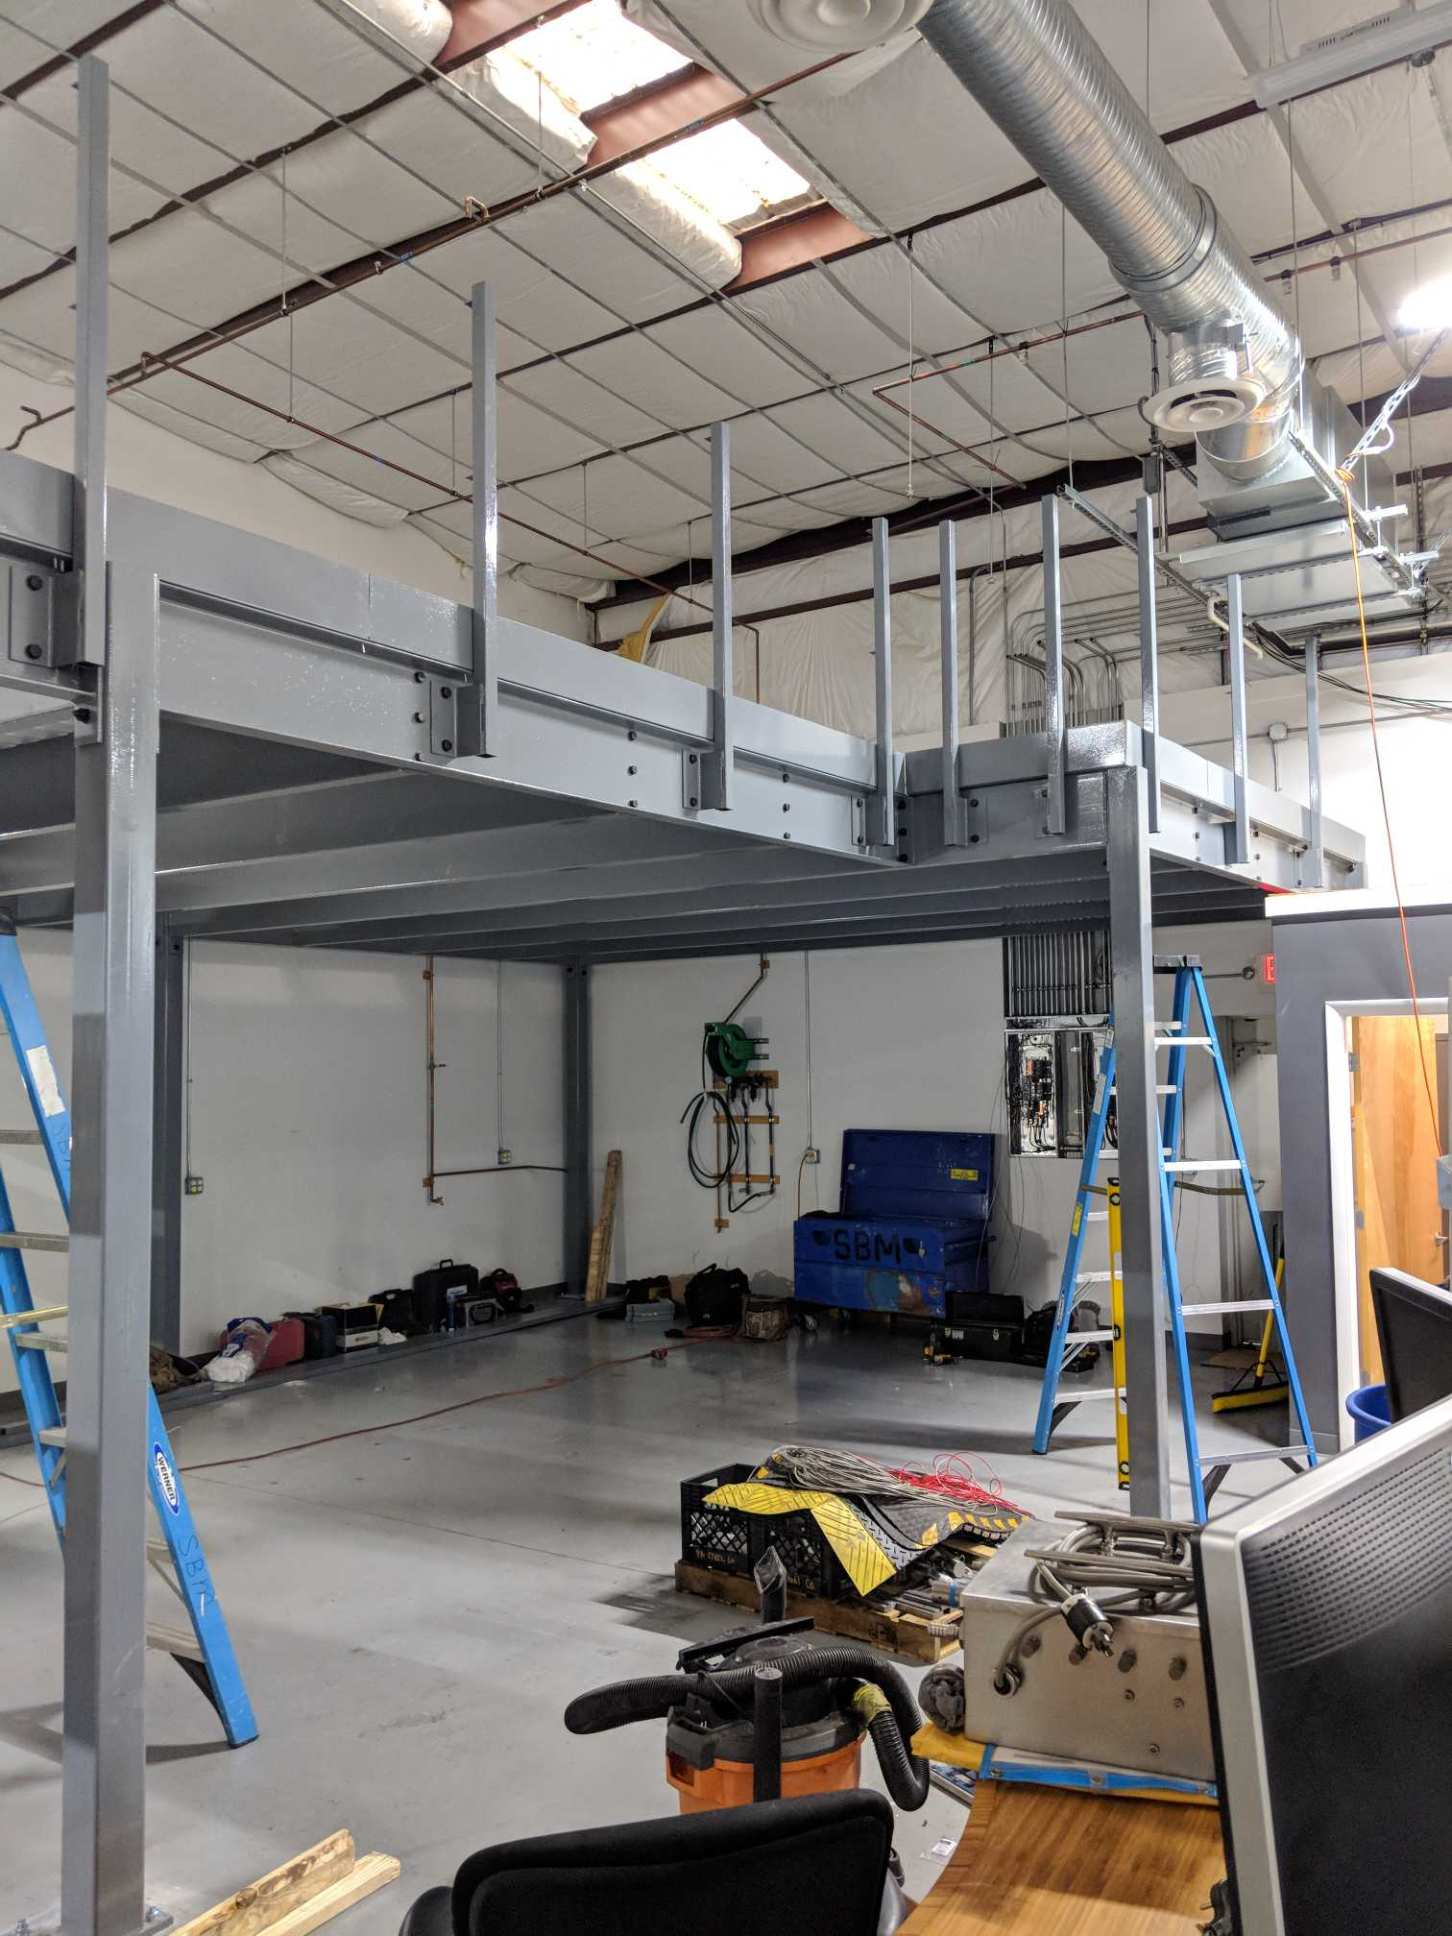 Mezzanine Construction